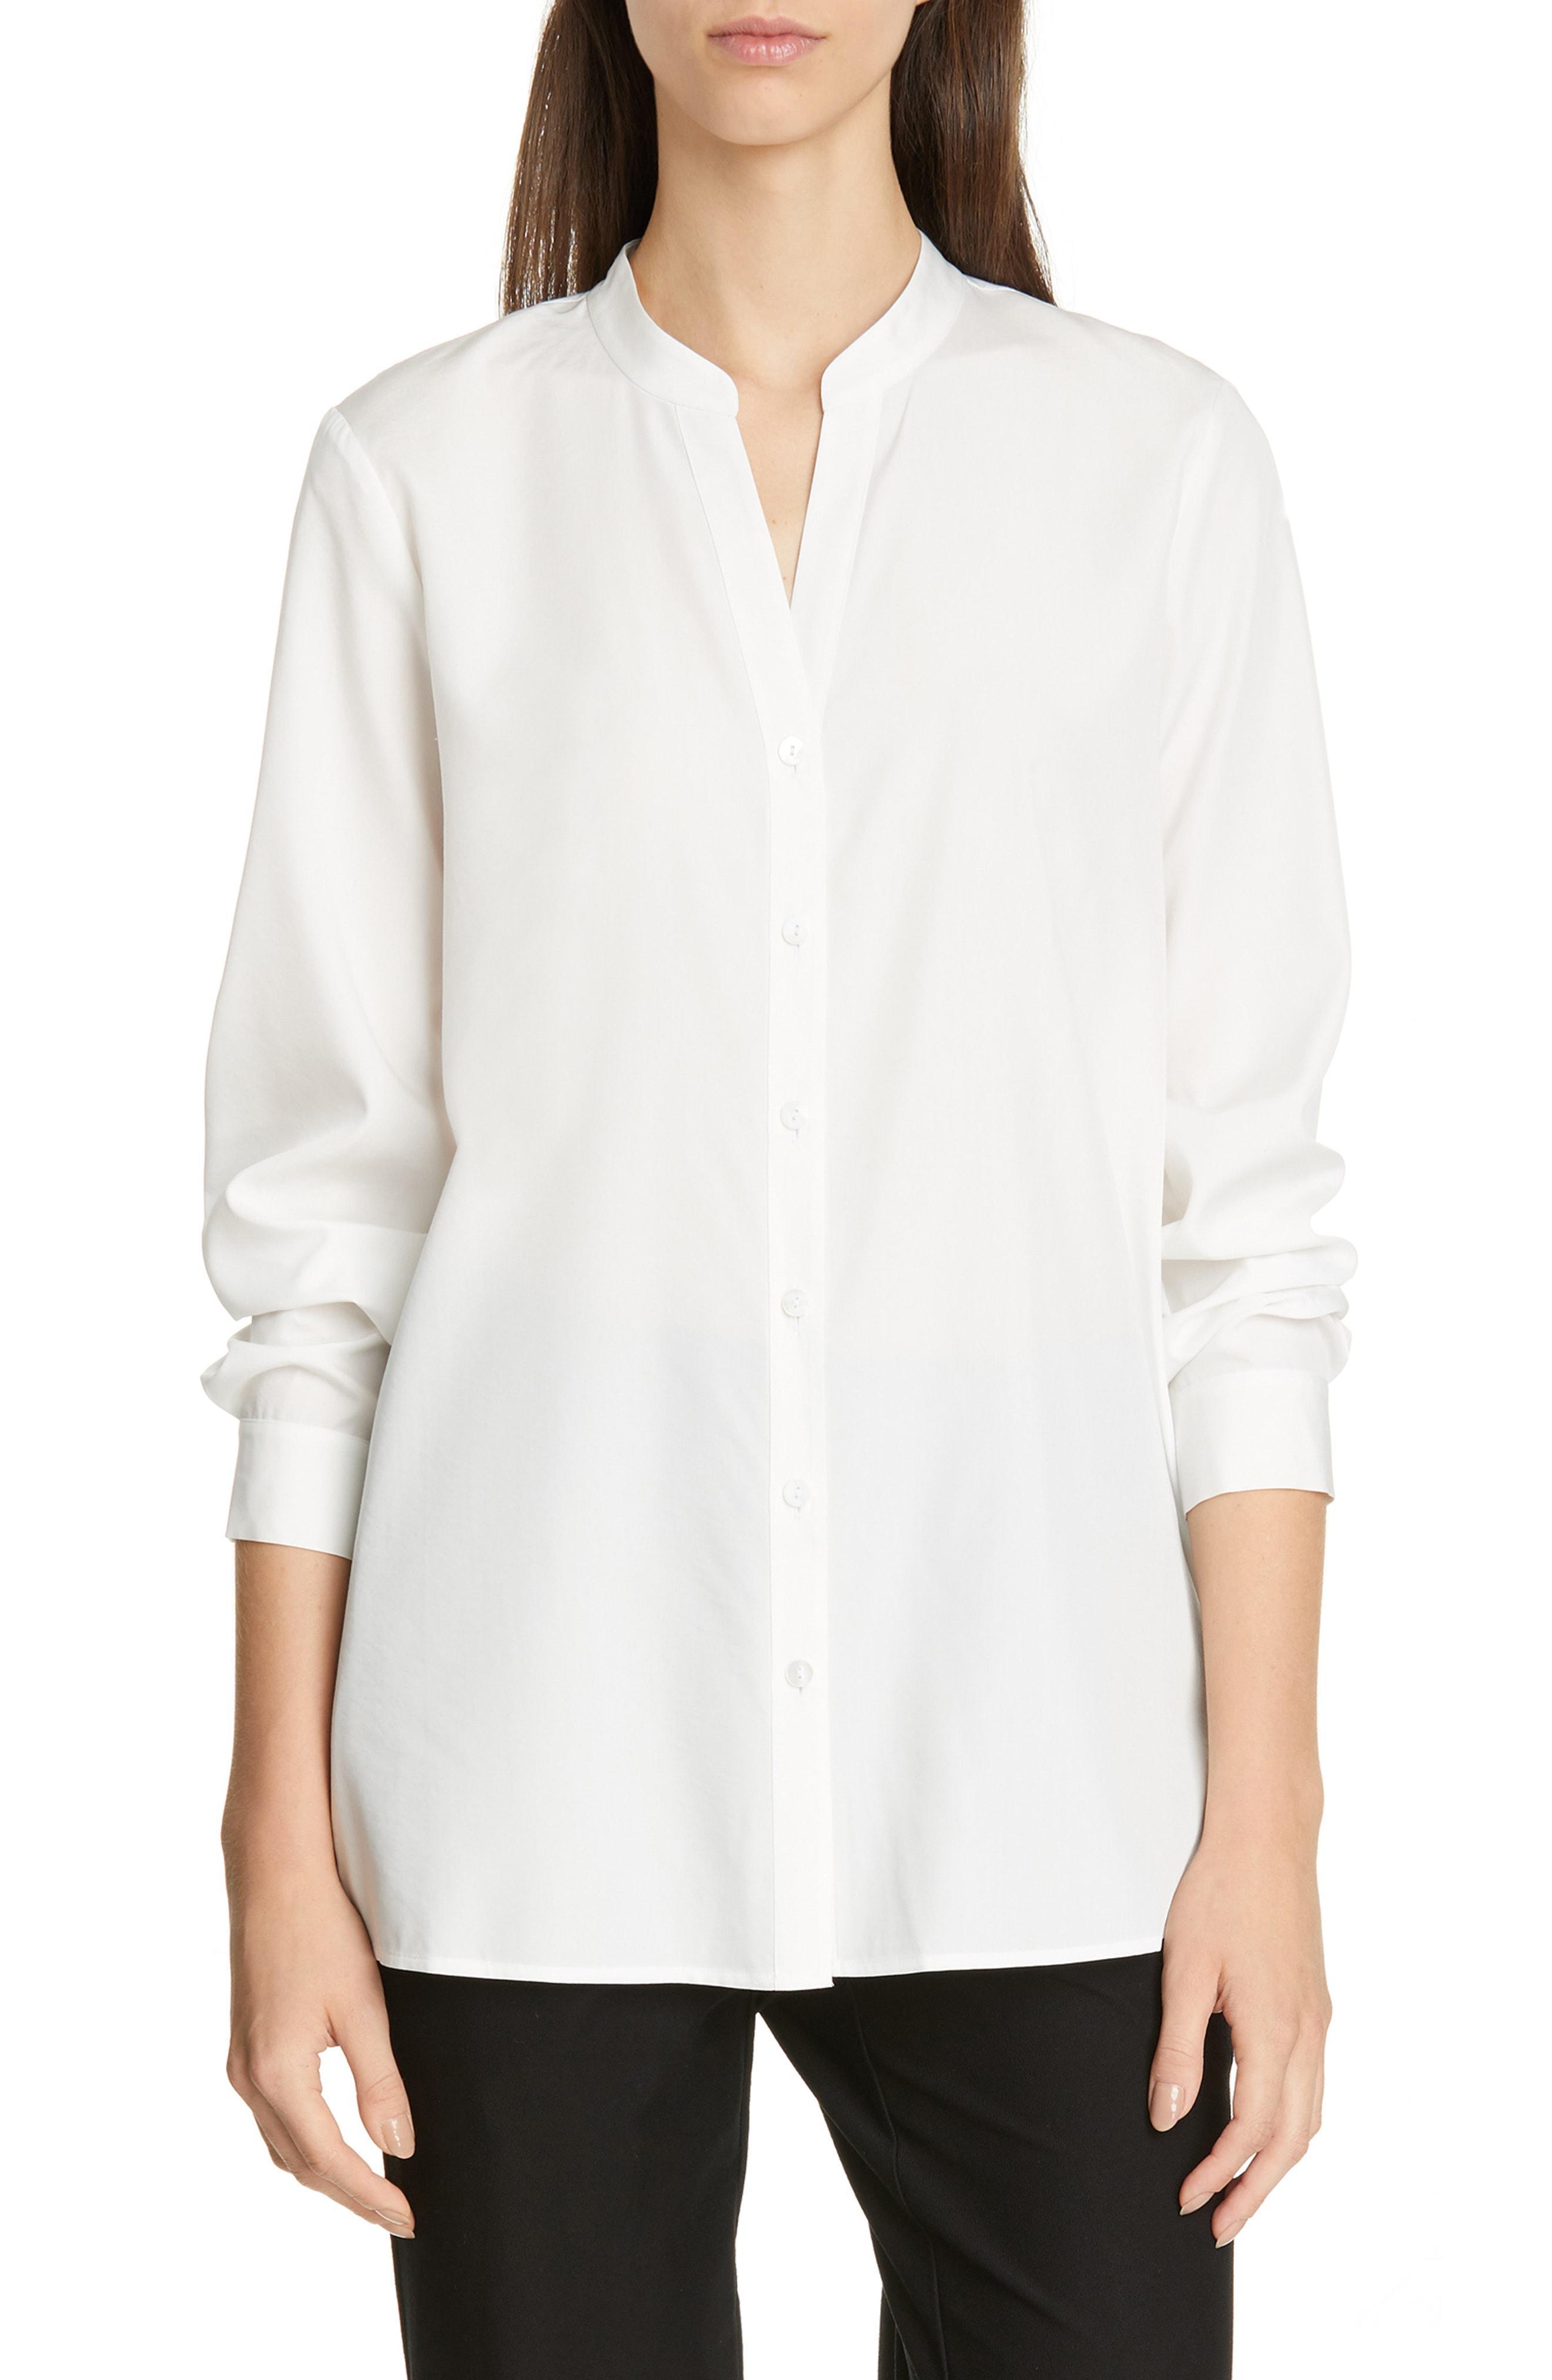 b9f44e5d12fe Lyst - Eileen Fisher Mandarin Collar Shirt in Black